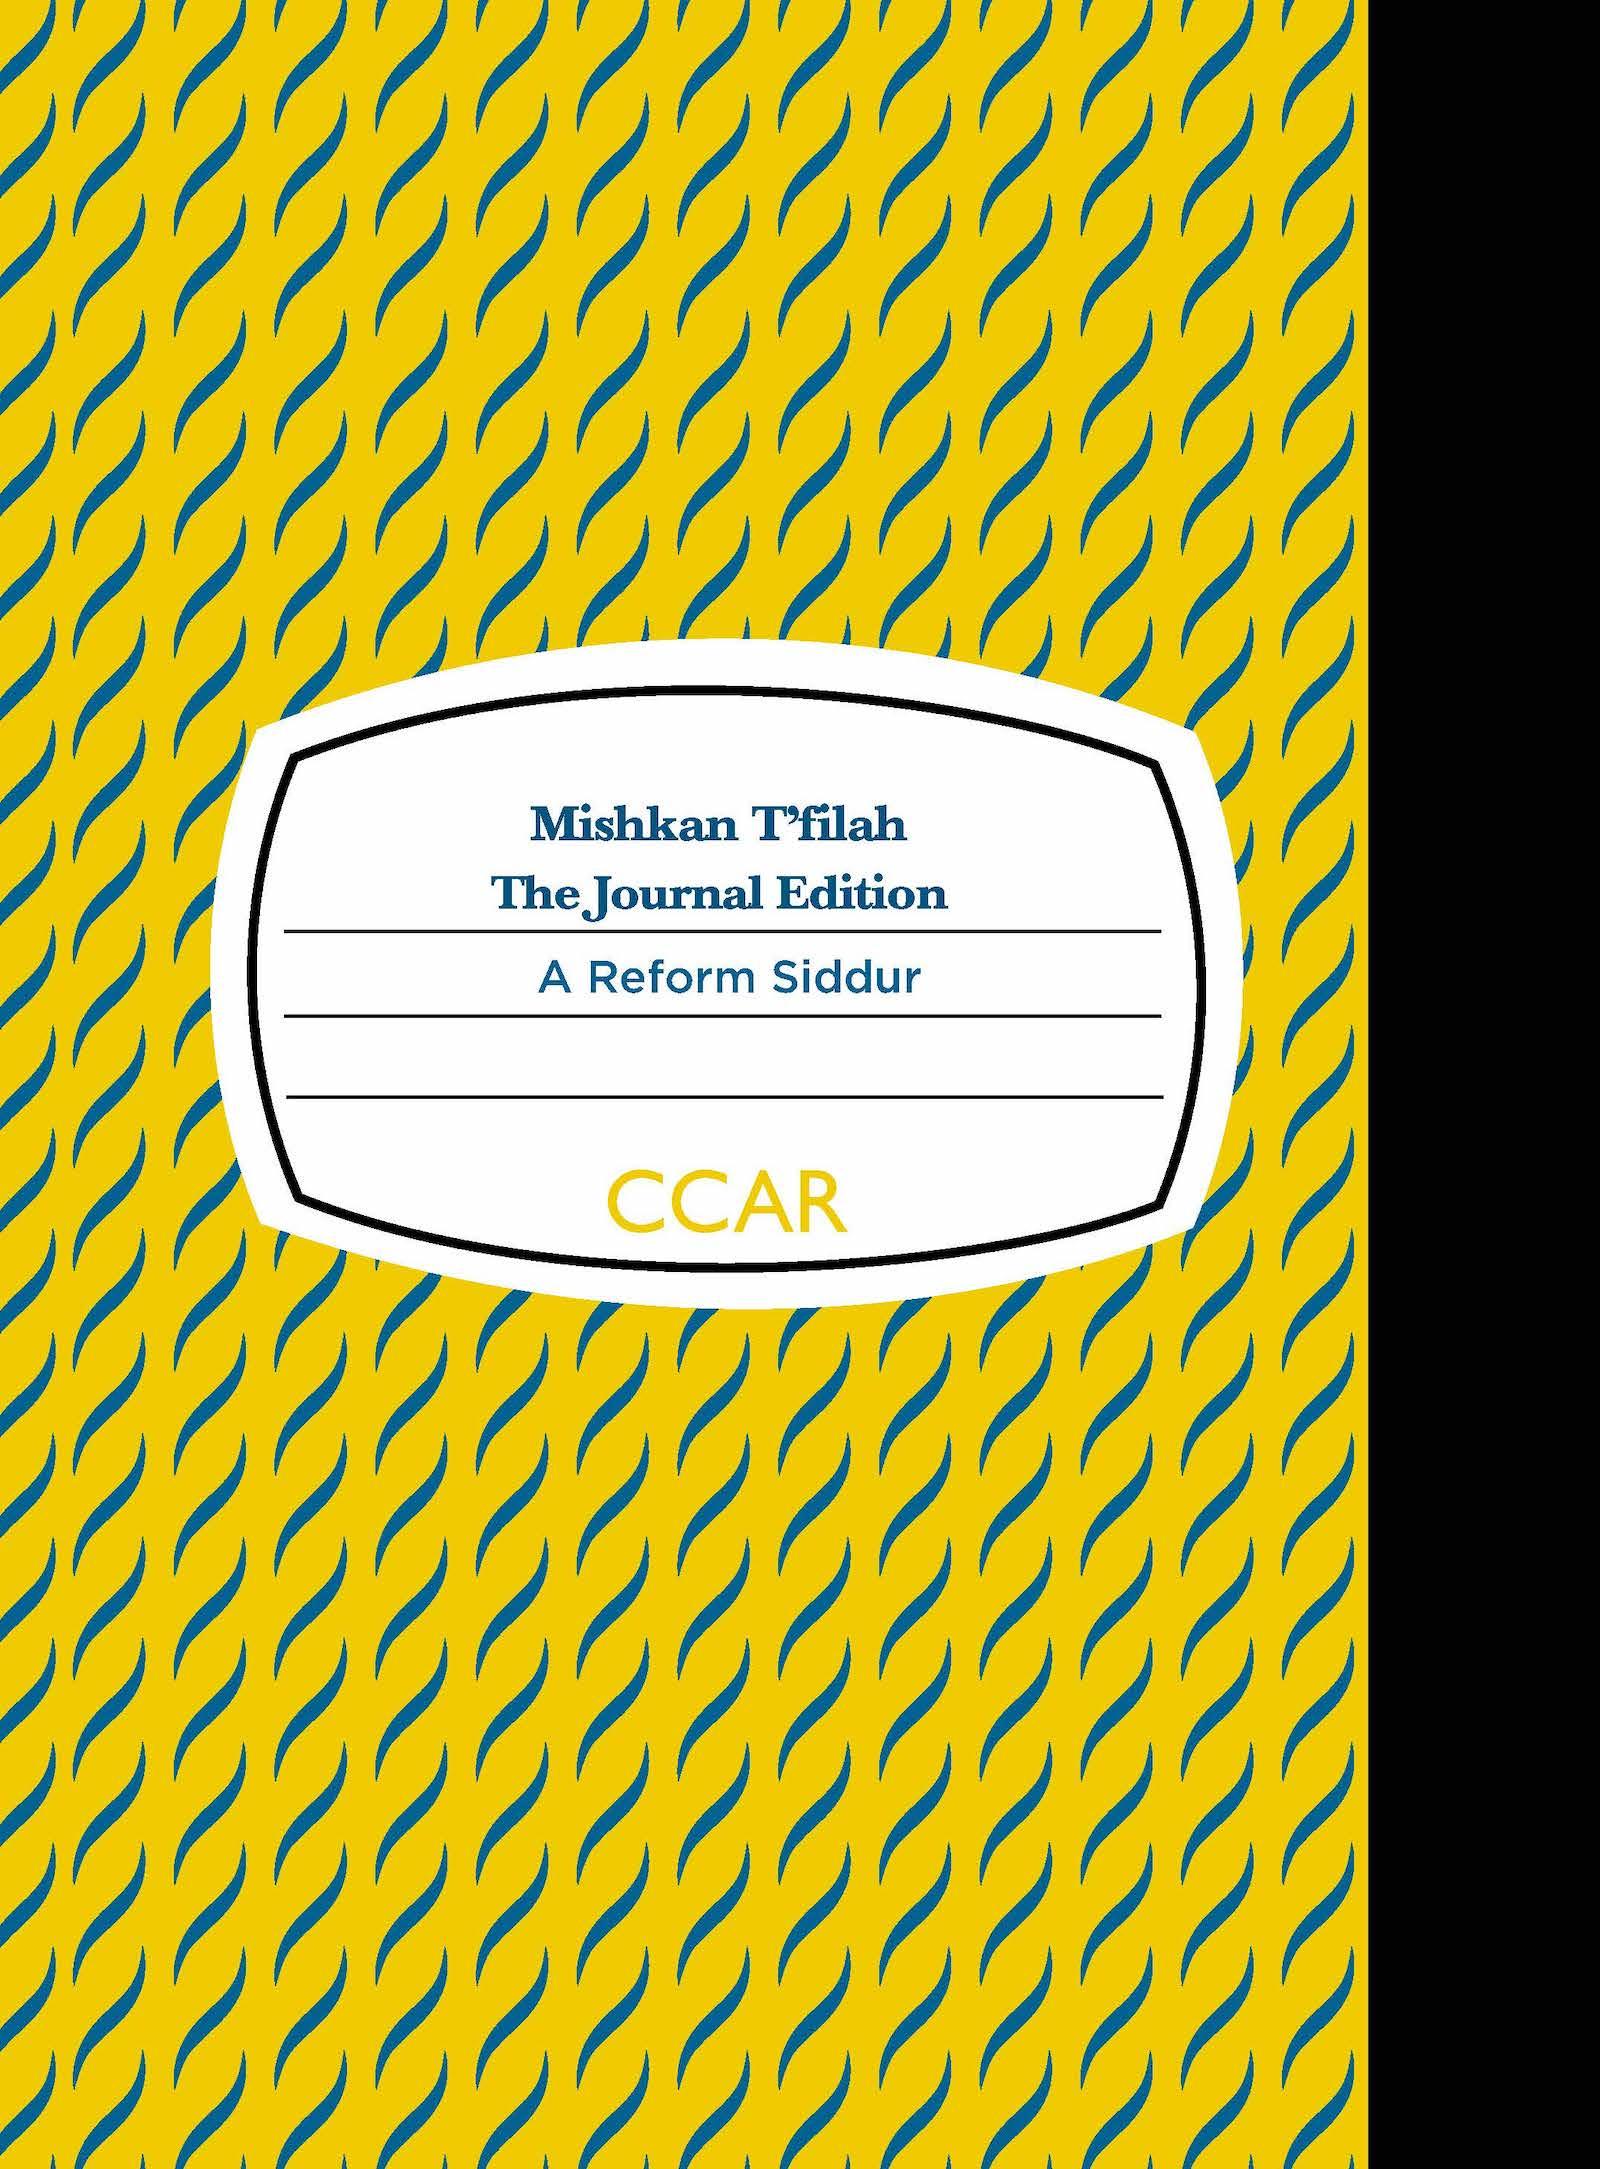 Mishkan T'filah: Journal Edition, Non-transliterated